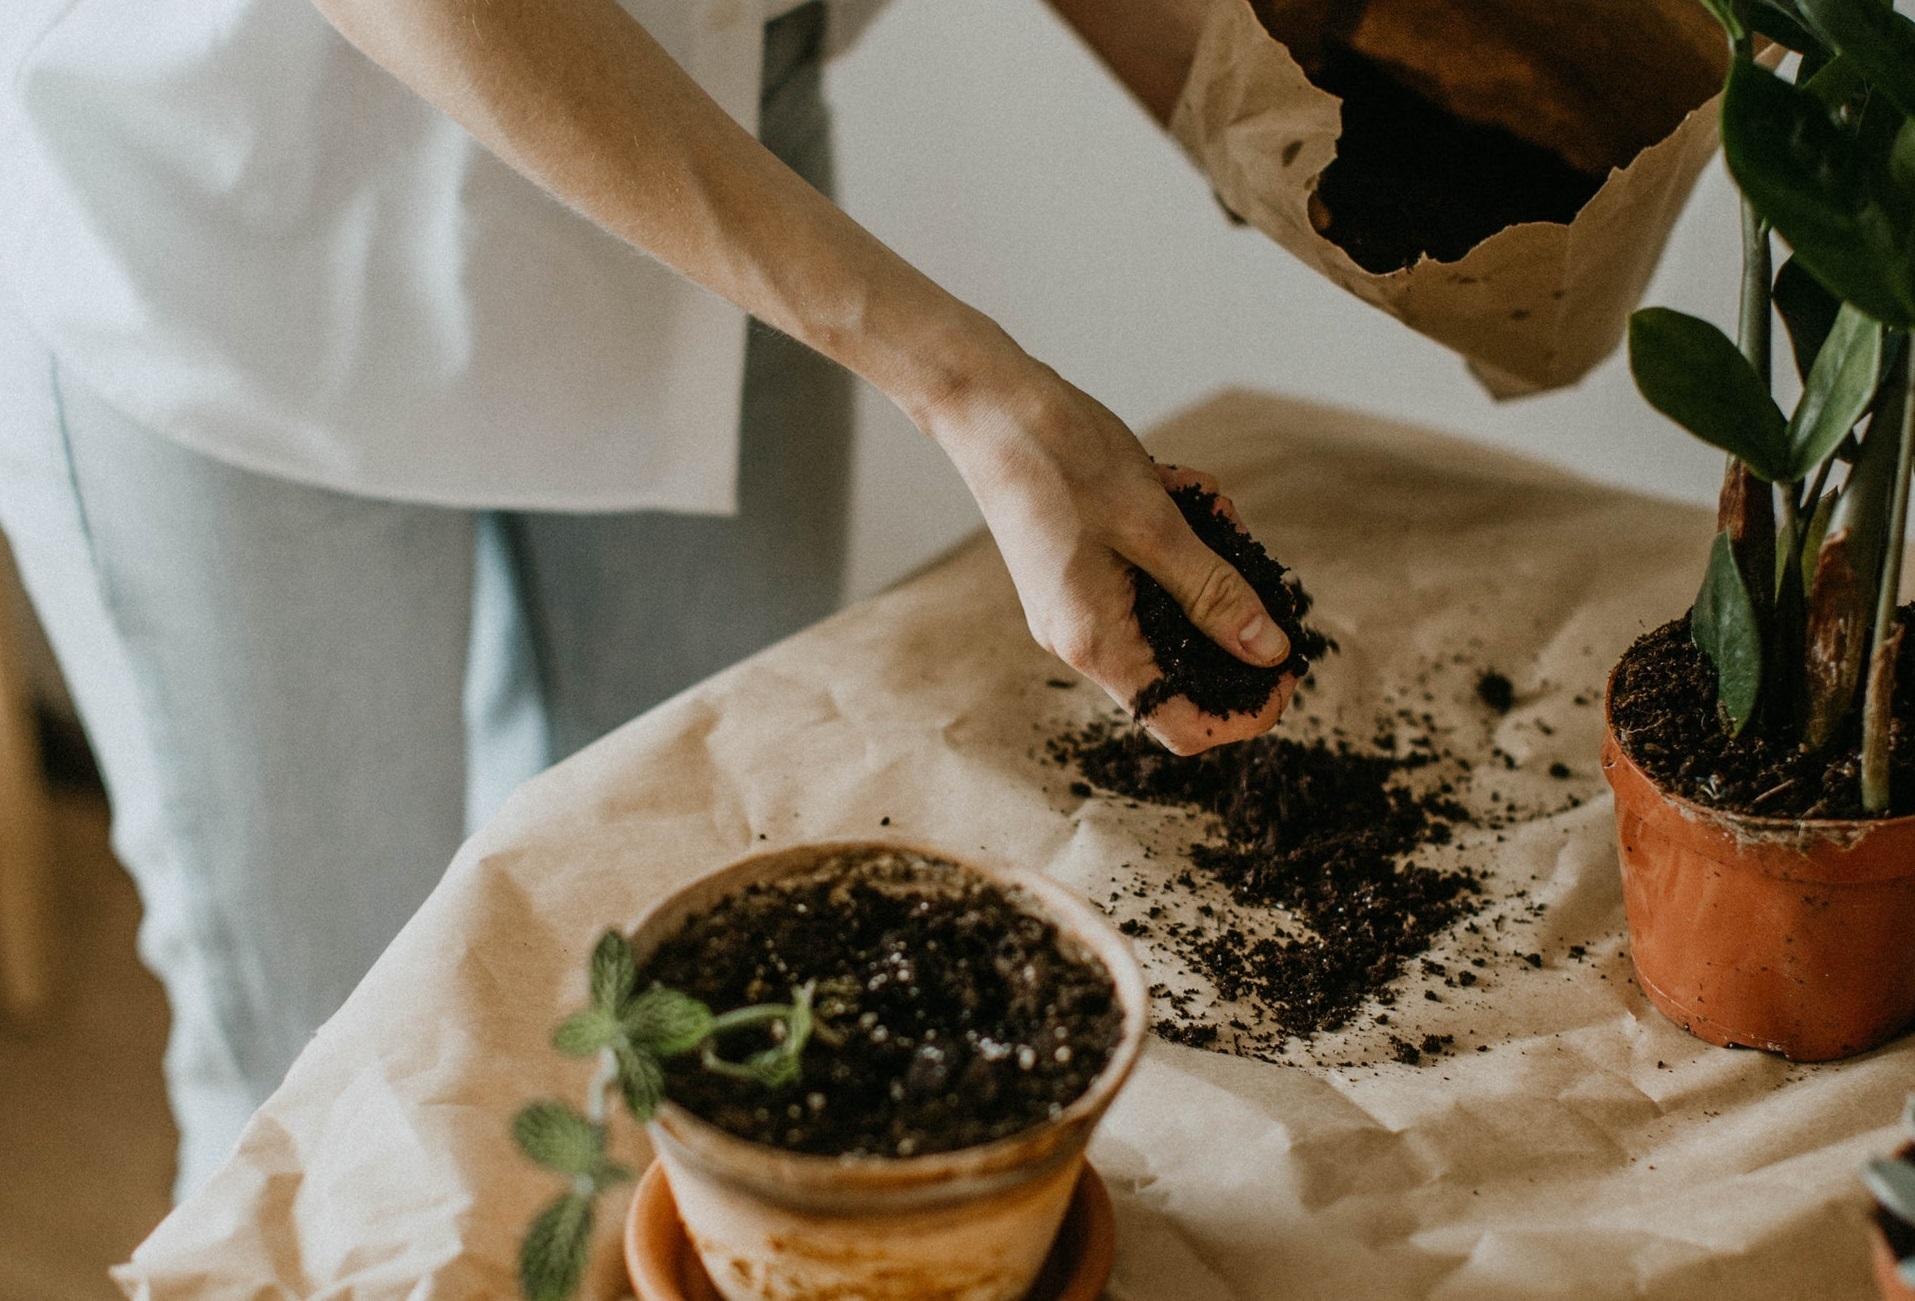 Use Organic Fertilizer